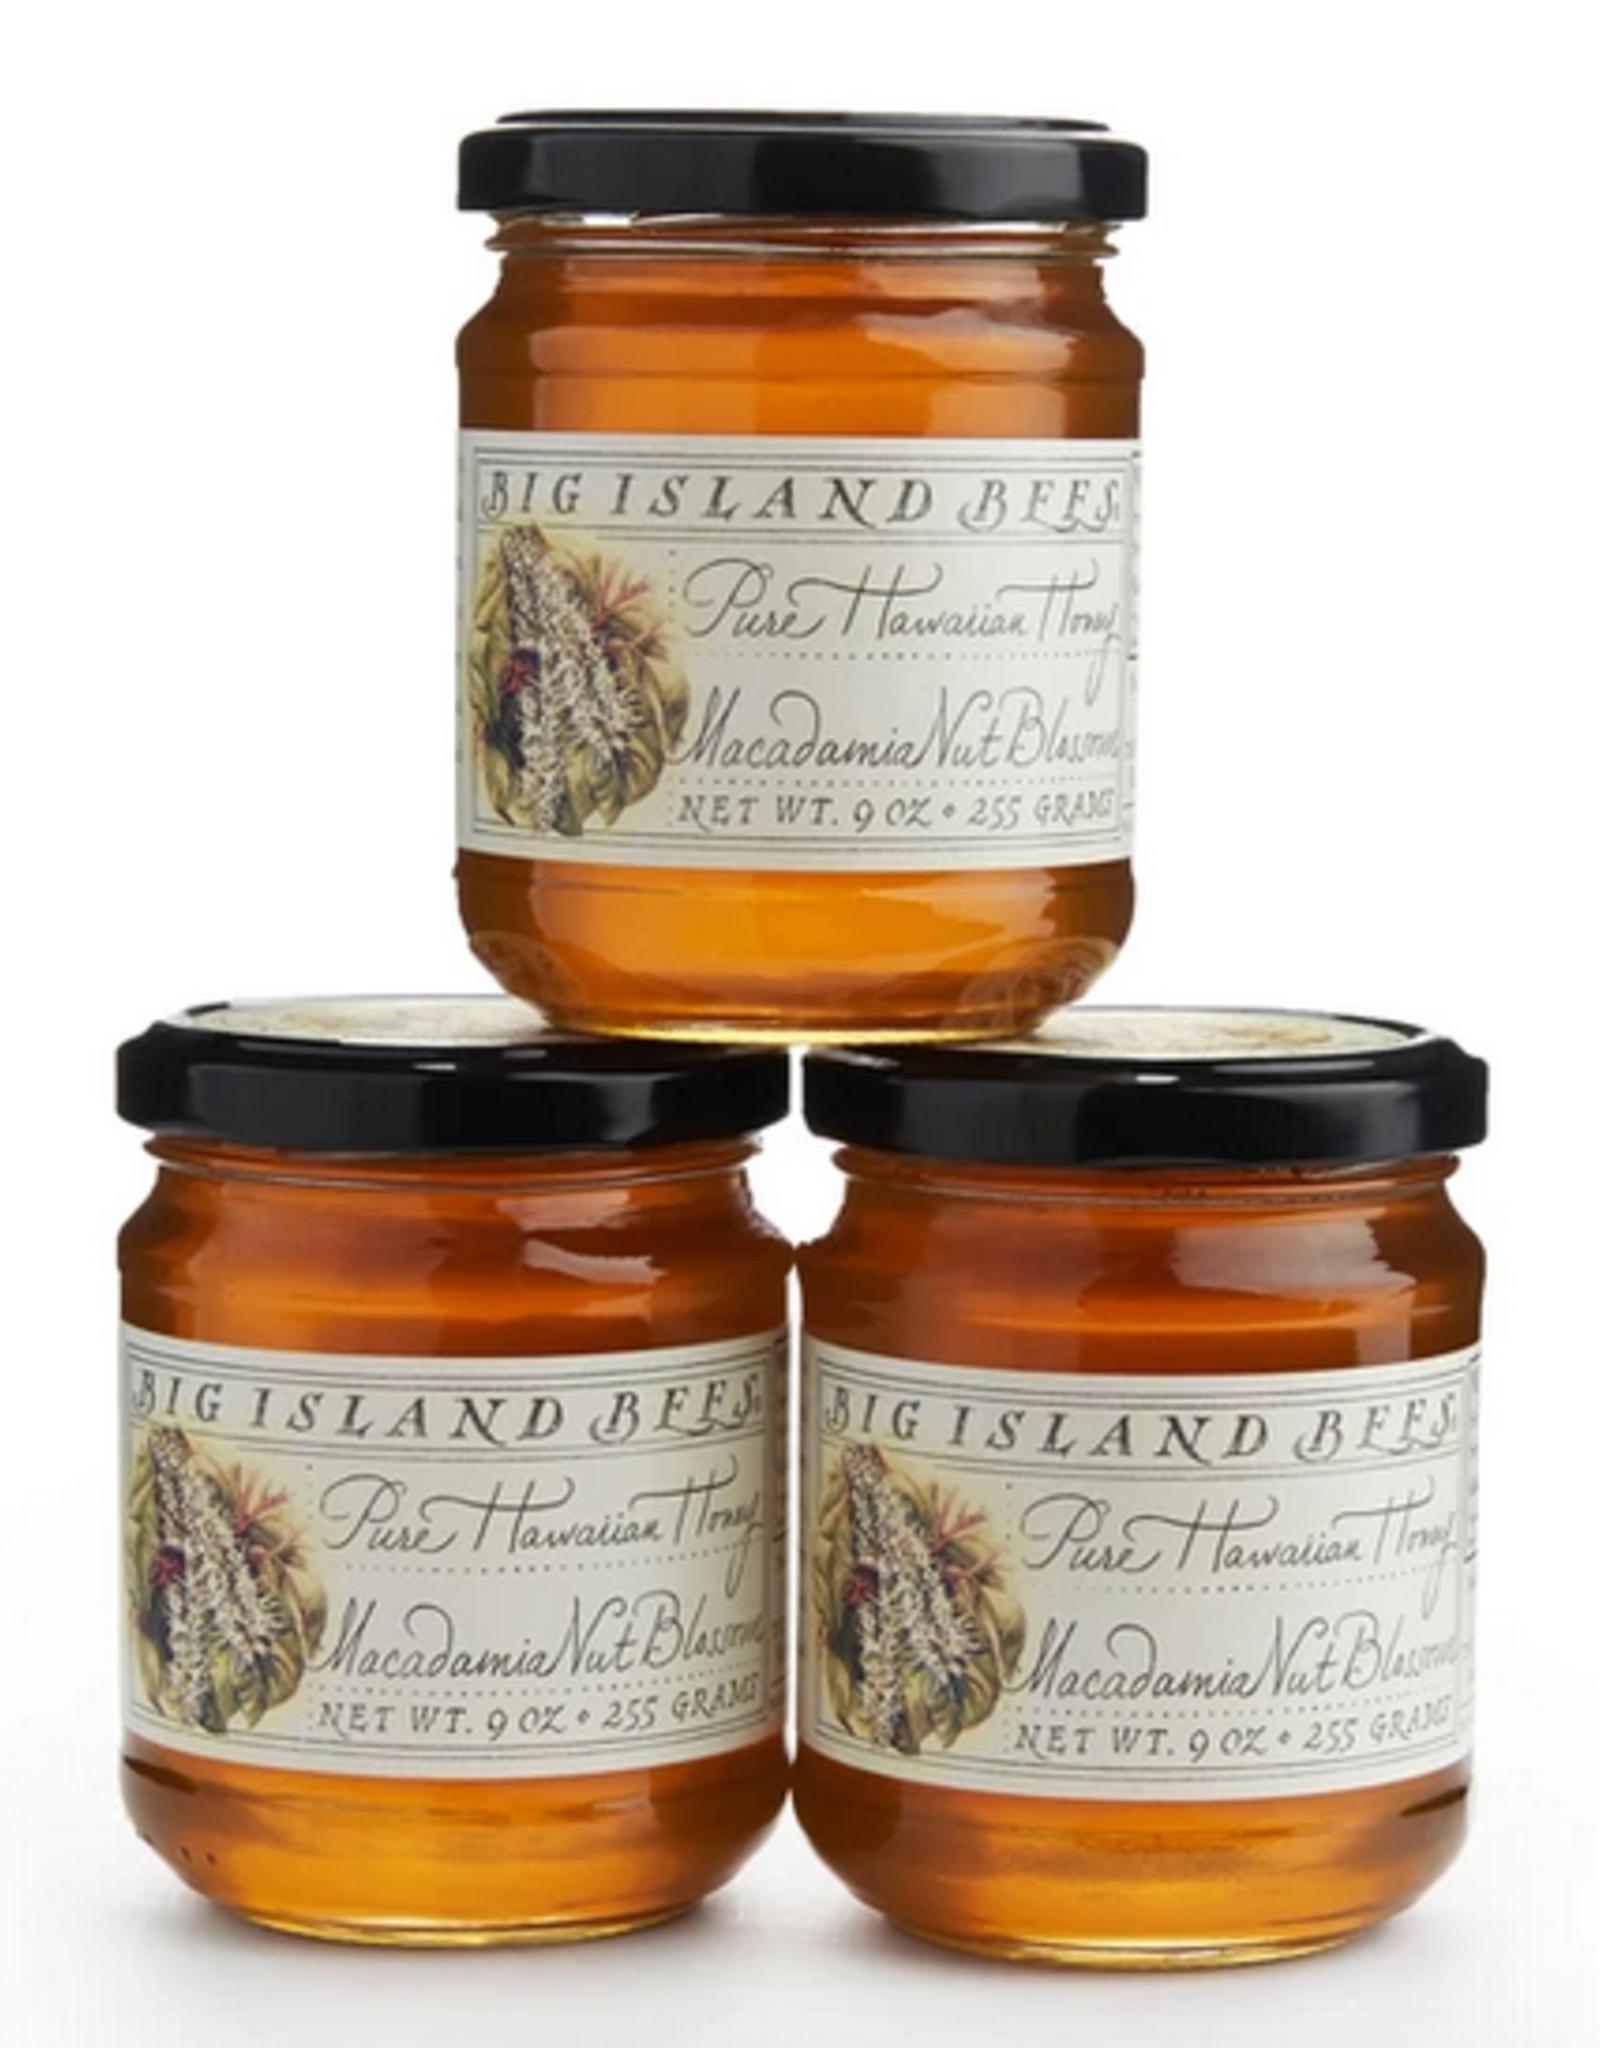 Big Island Bees Illustrated Gift Box 4.5oz Asst. Honey